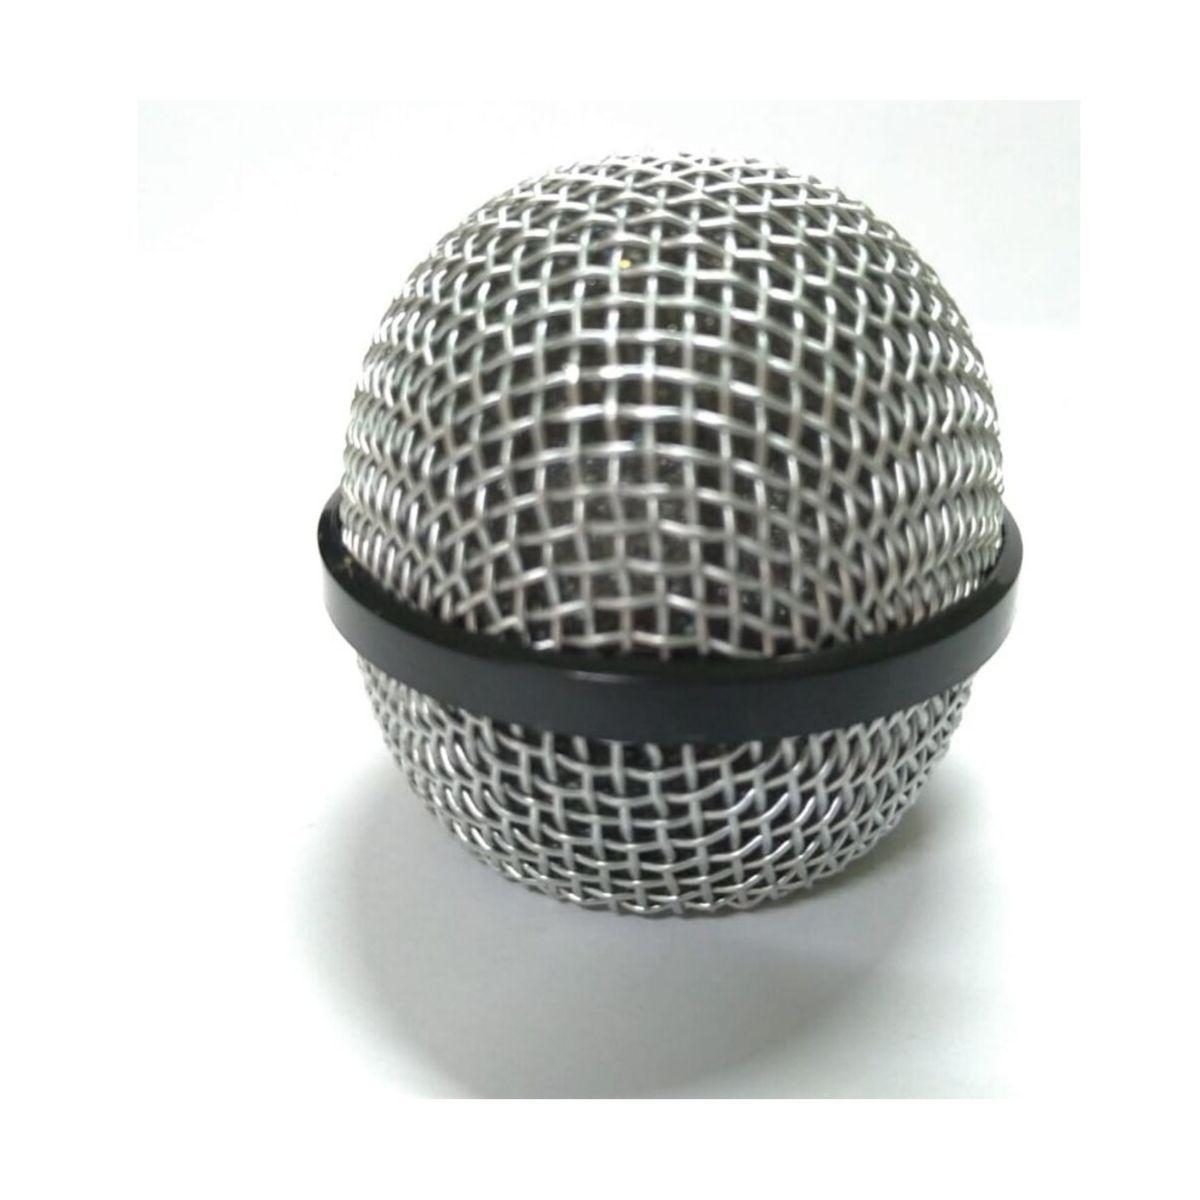 Cabeça De Microfone Profissional Revestida Globo